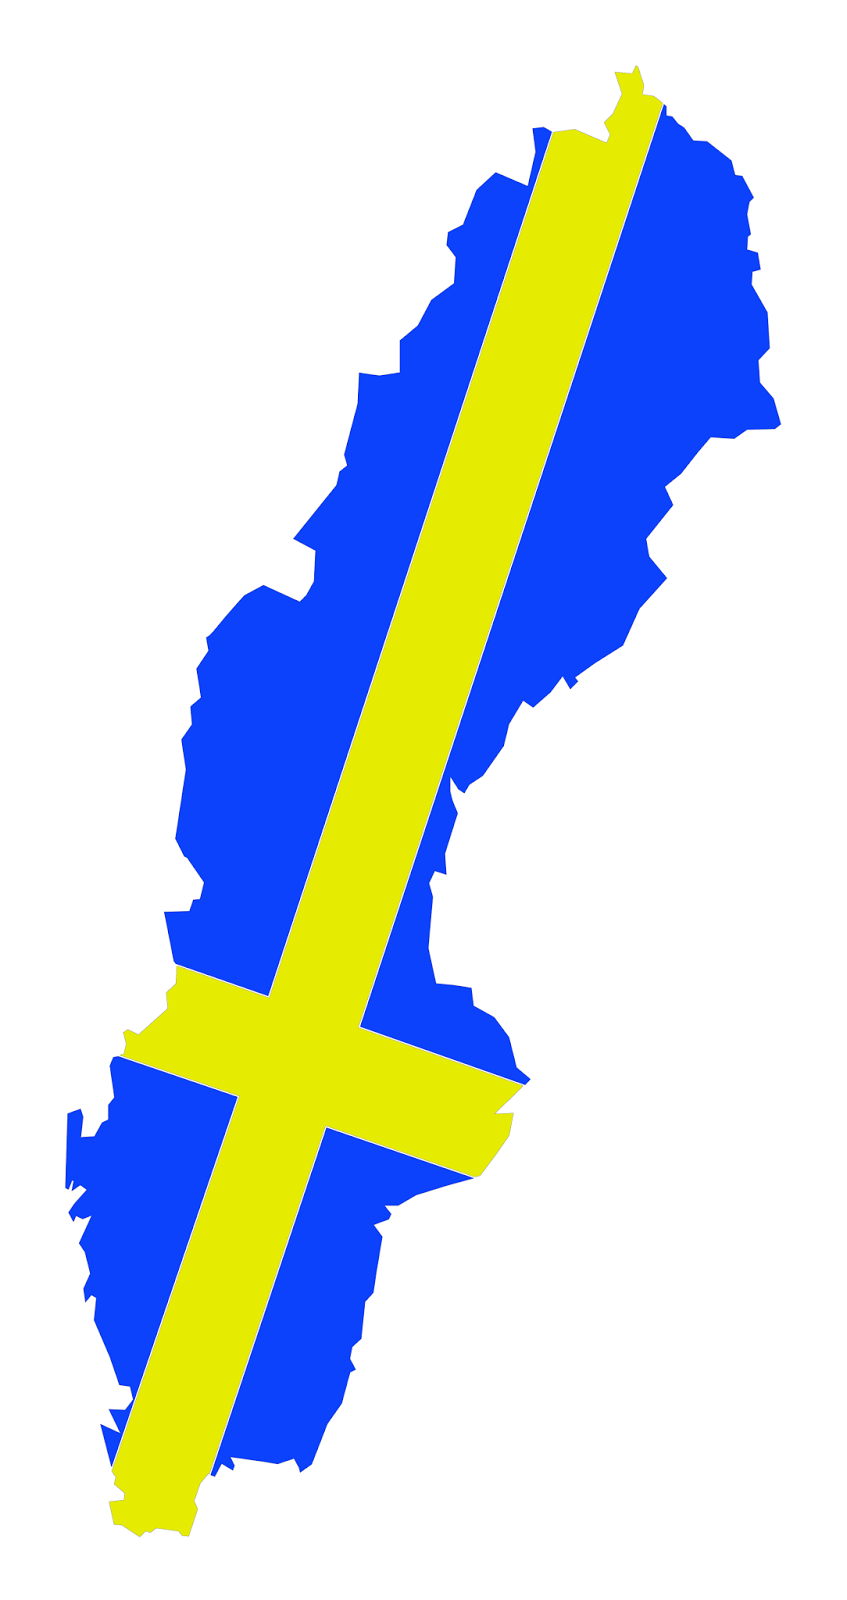 Transudationism: Sweden far-right makes huge election gains